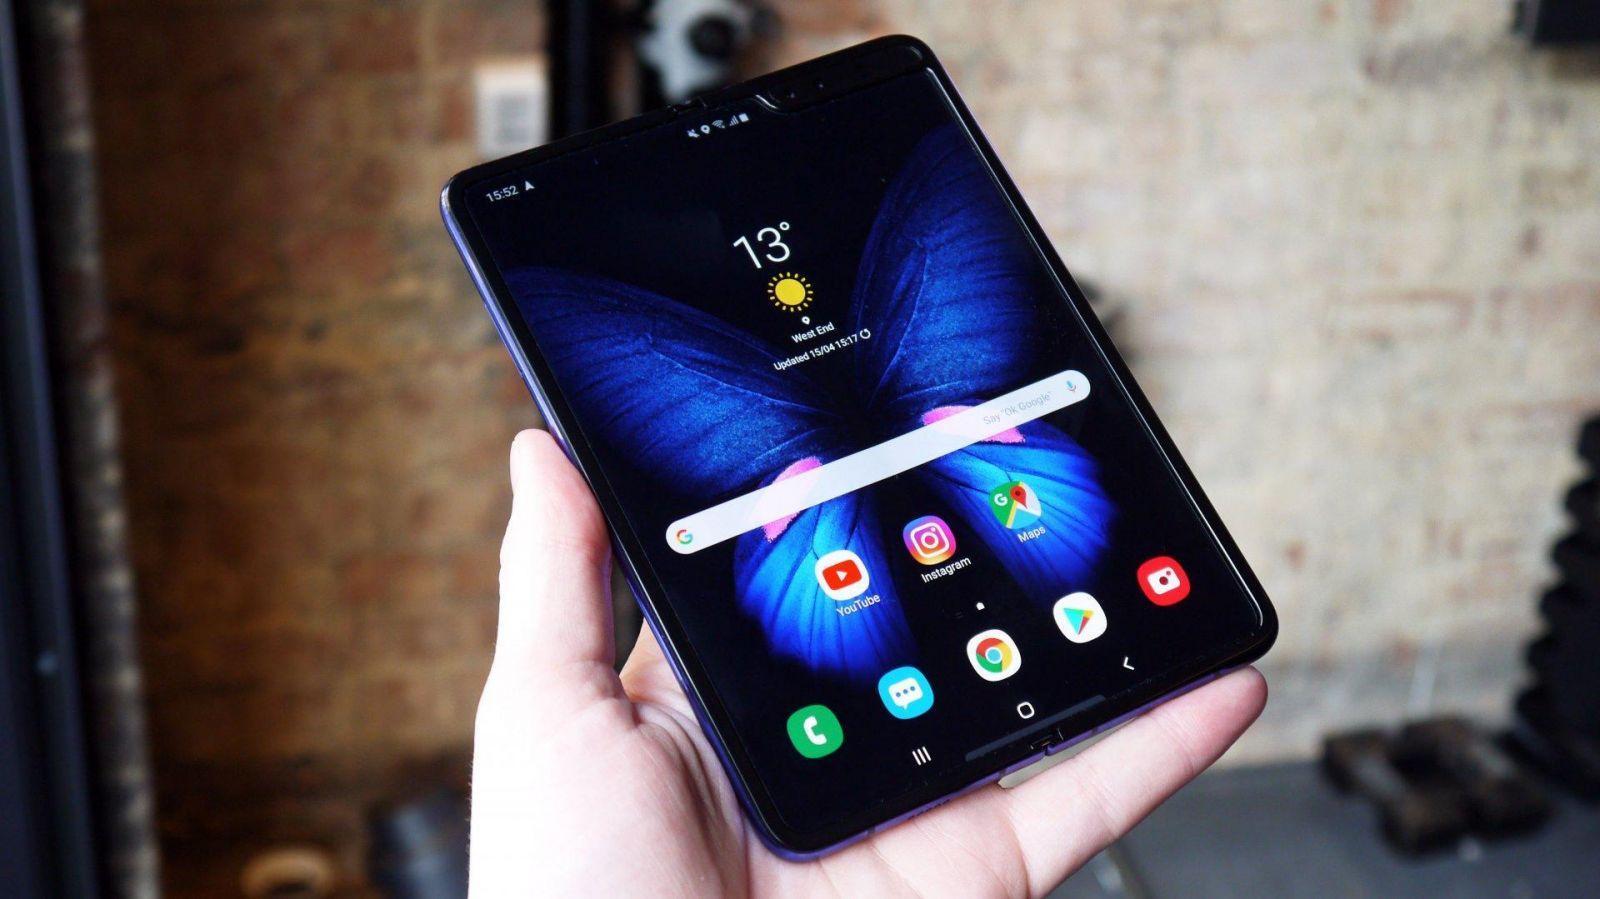 В Samsung обьявили дату выхода Galaxy Fold (ccwajrgfrni7go65kti2n7)